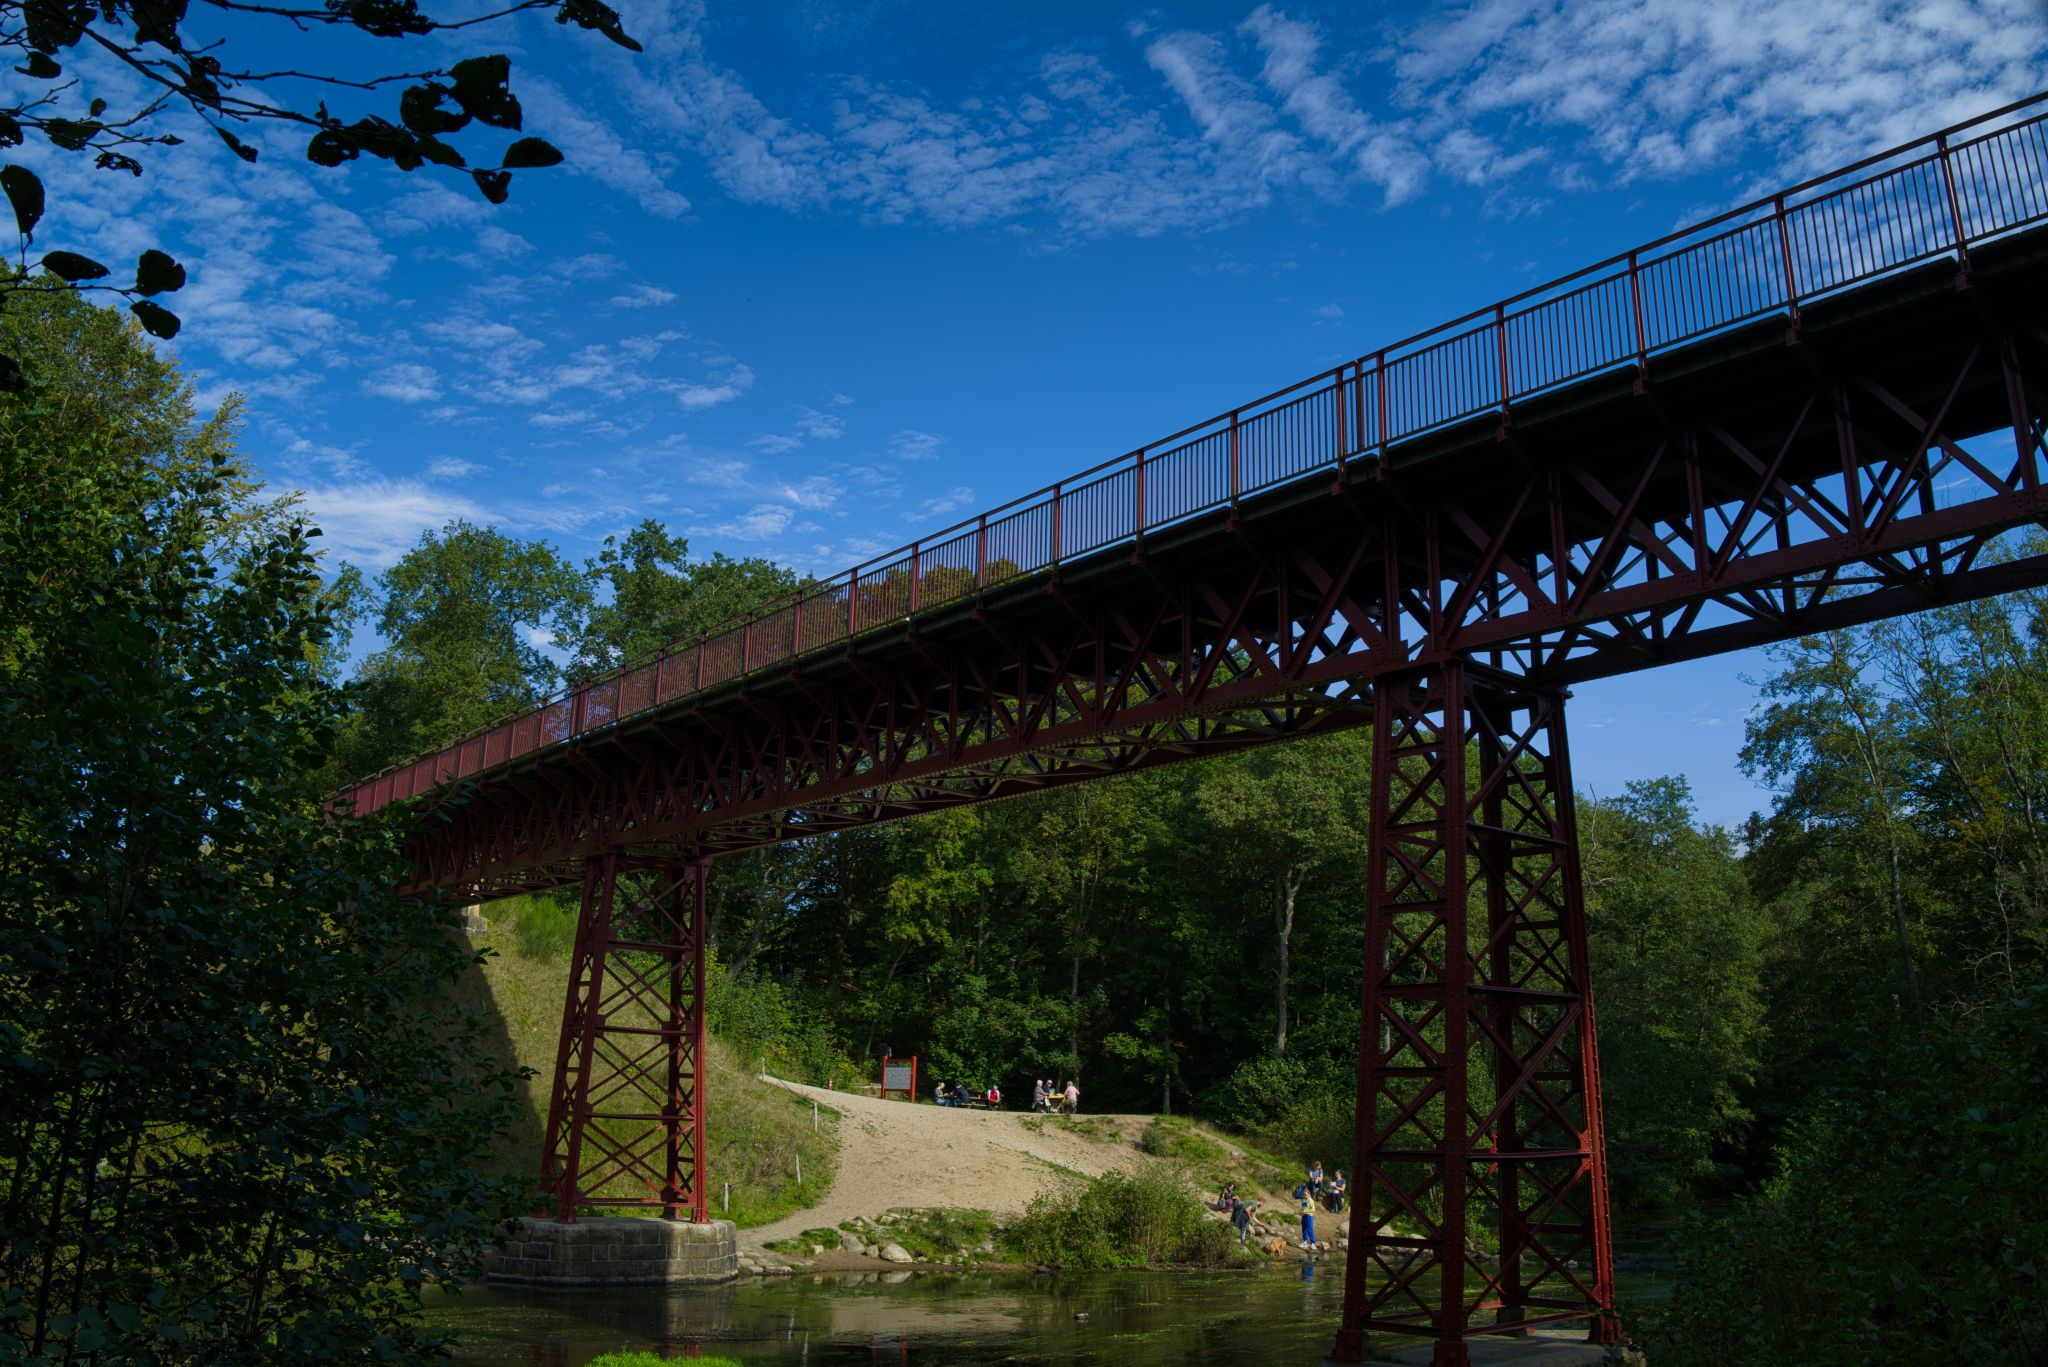 The recovered bridge, Denmark